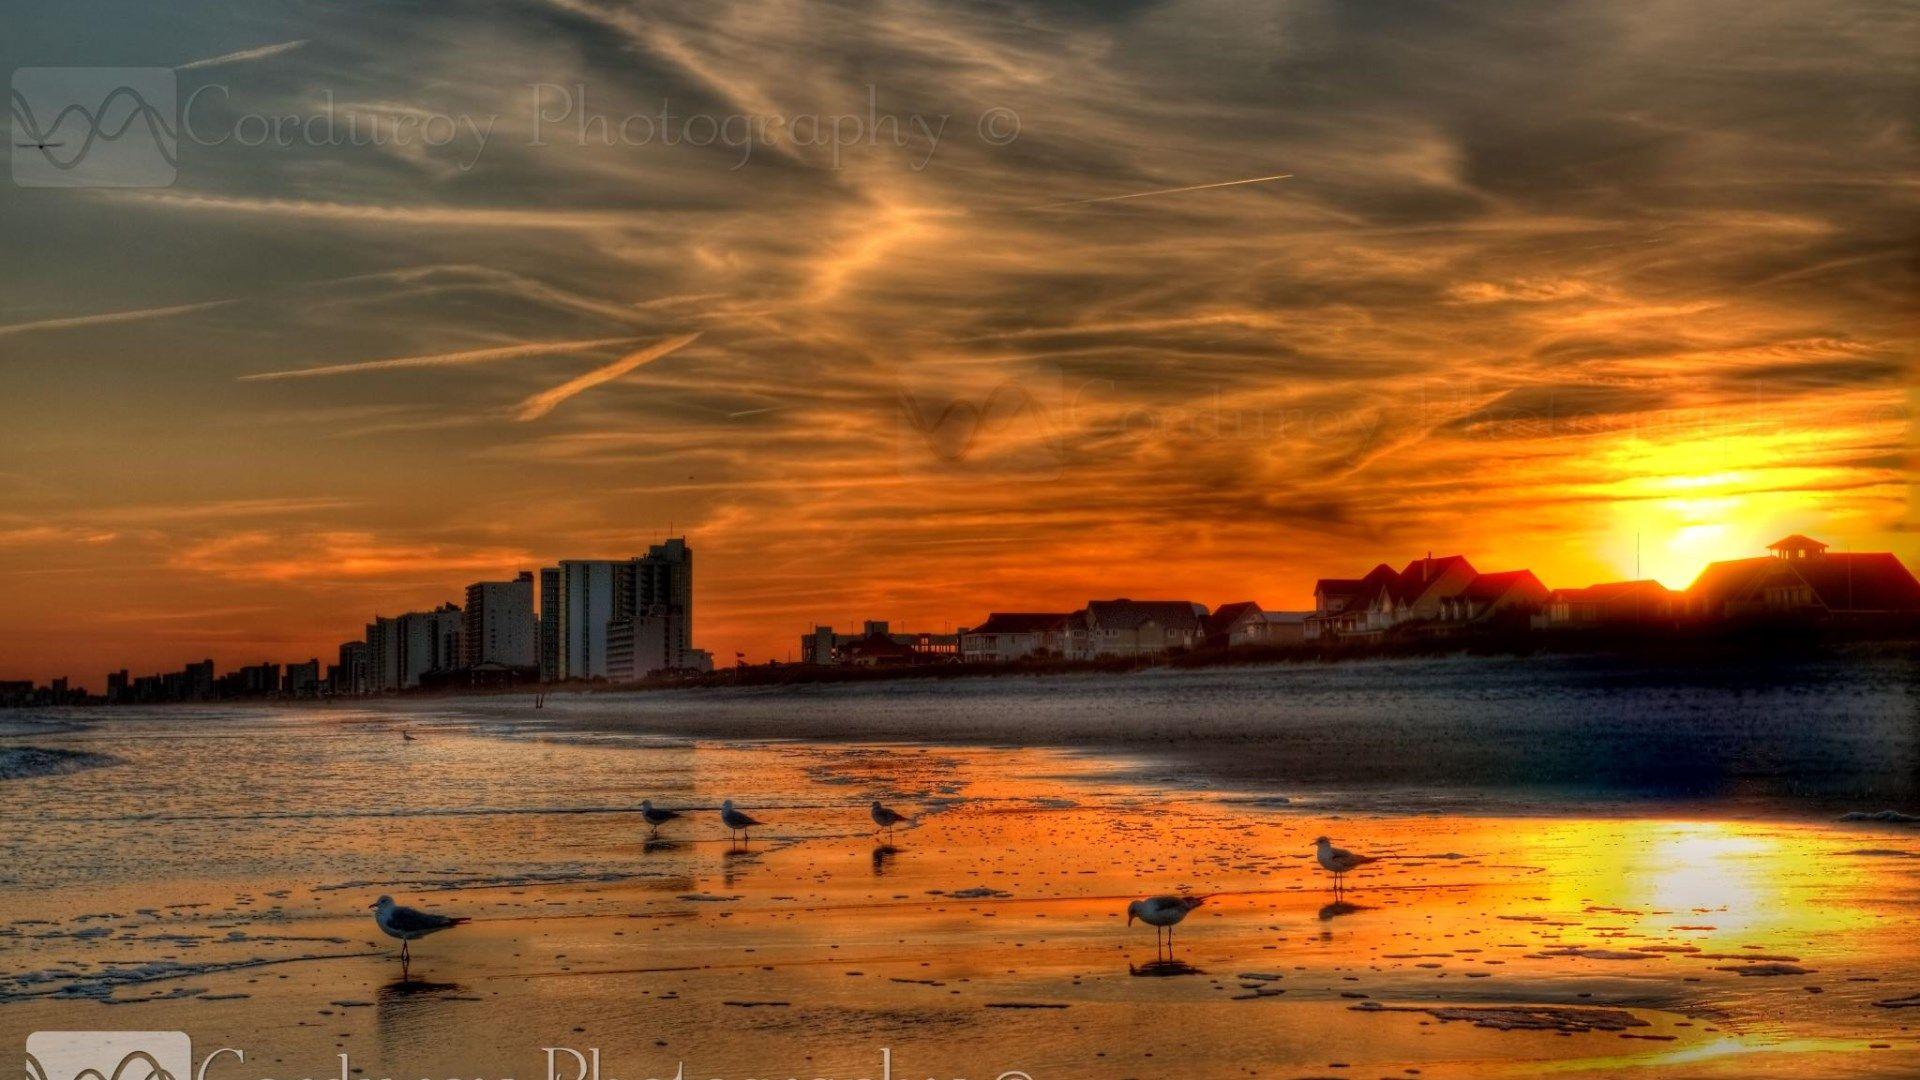 Corduroy Photography - Garden City Beach | ✈ TRV - The Beach ...